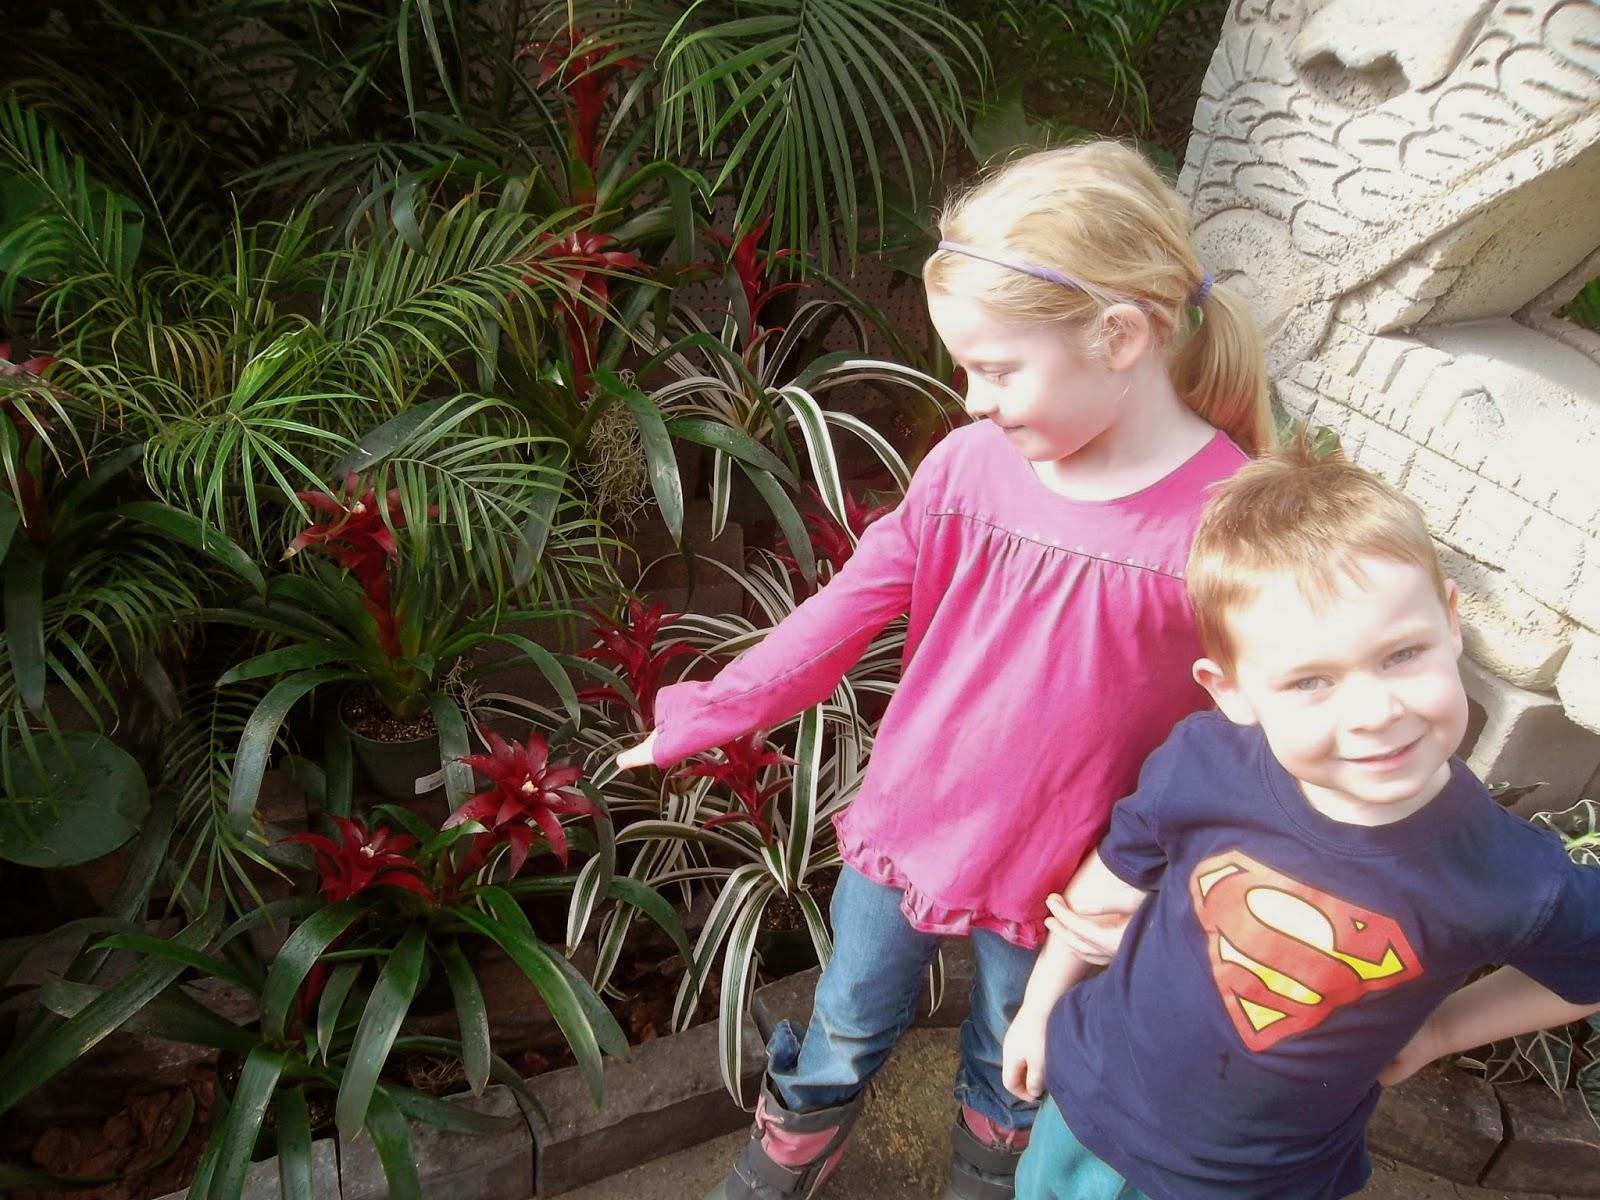 Roxanne et j r my visites aux papillons du jardin hamel for Jardin hamel papillon 2016